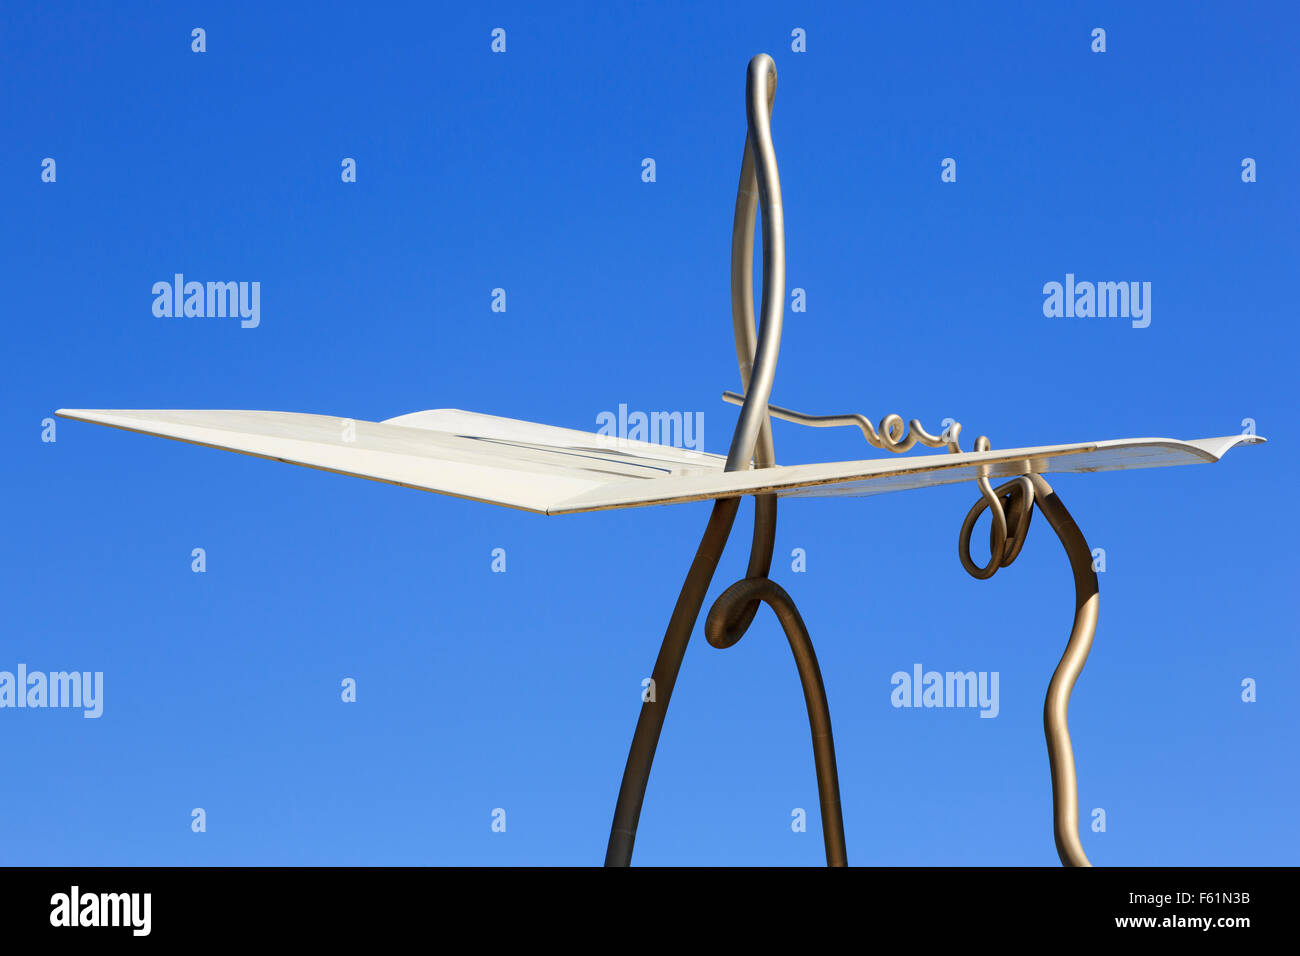 David i Goliat sculpture by Antoni Llena, Ciutat Vella District, Barcelona, Catalonia, Spain, Europe - Stock Image